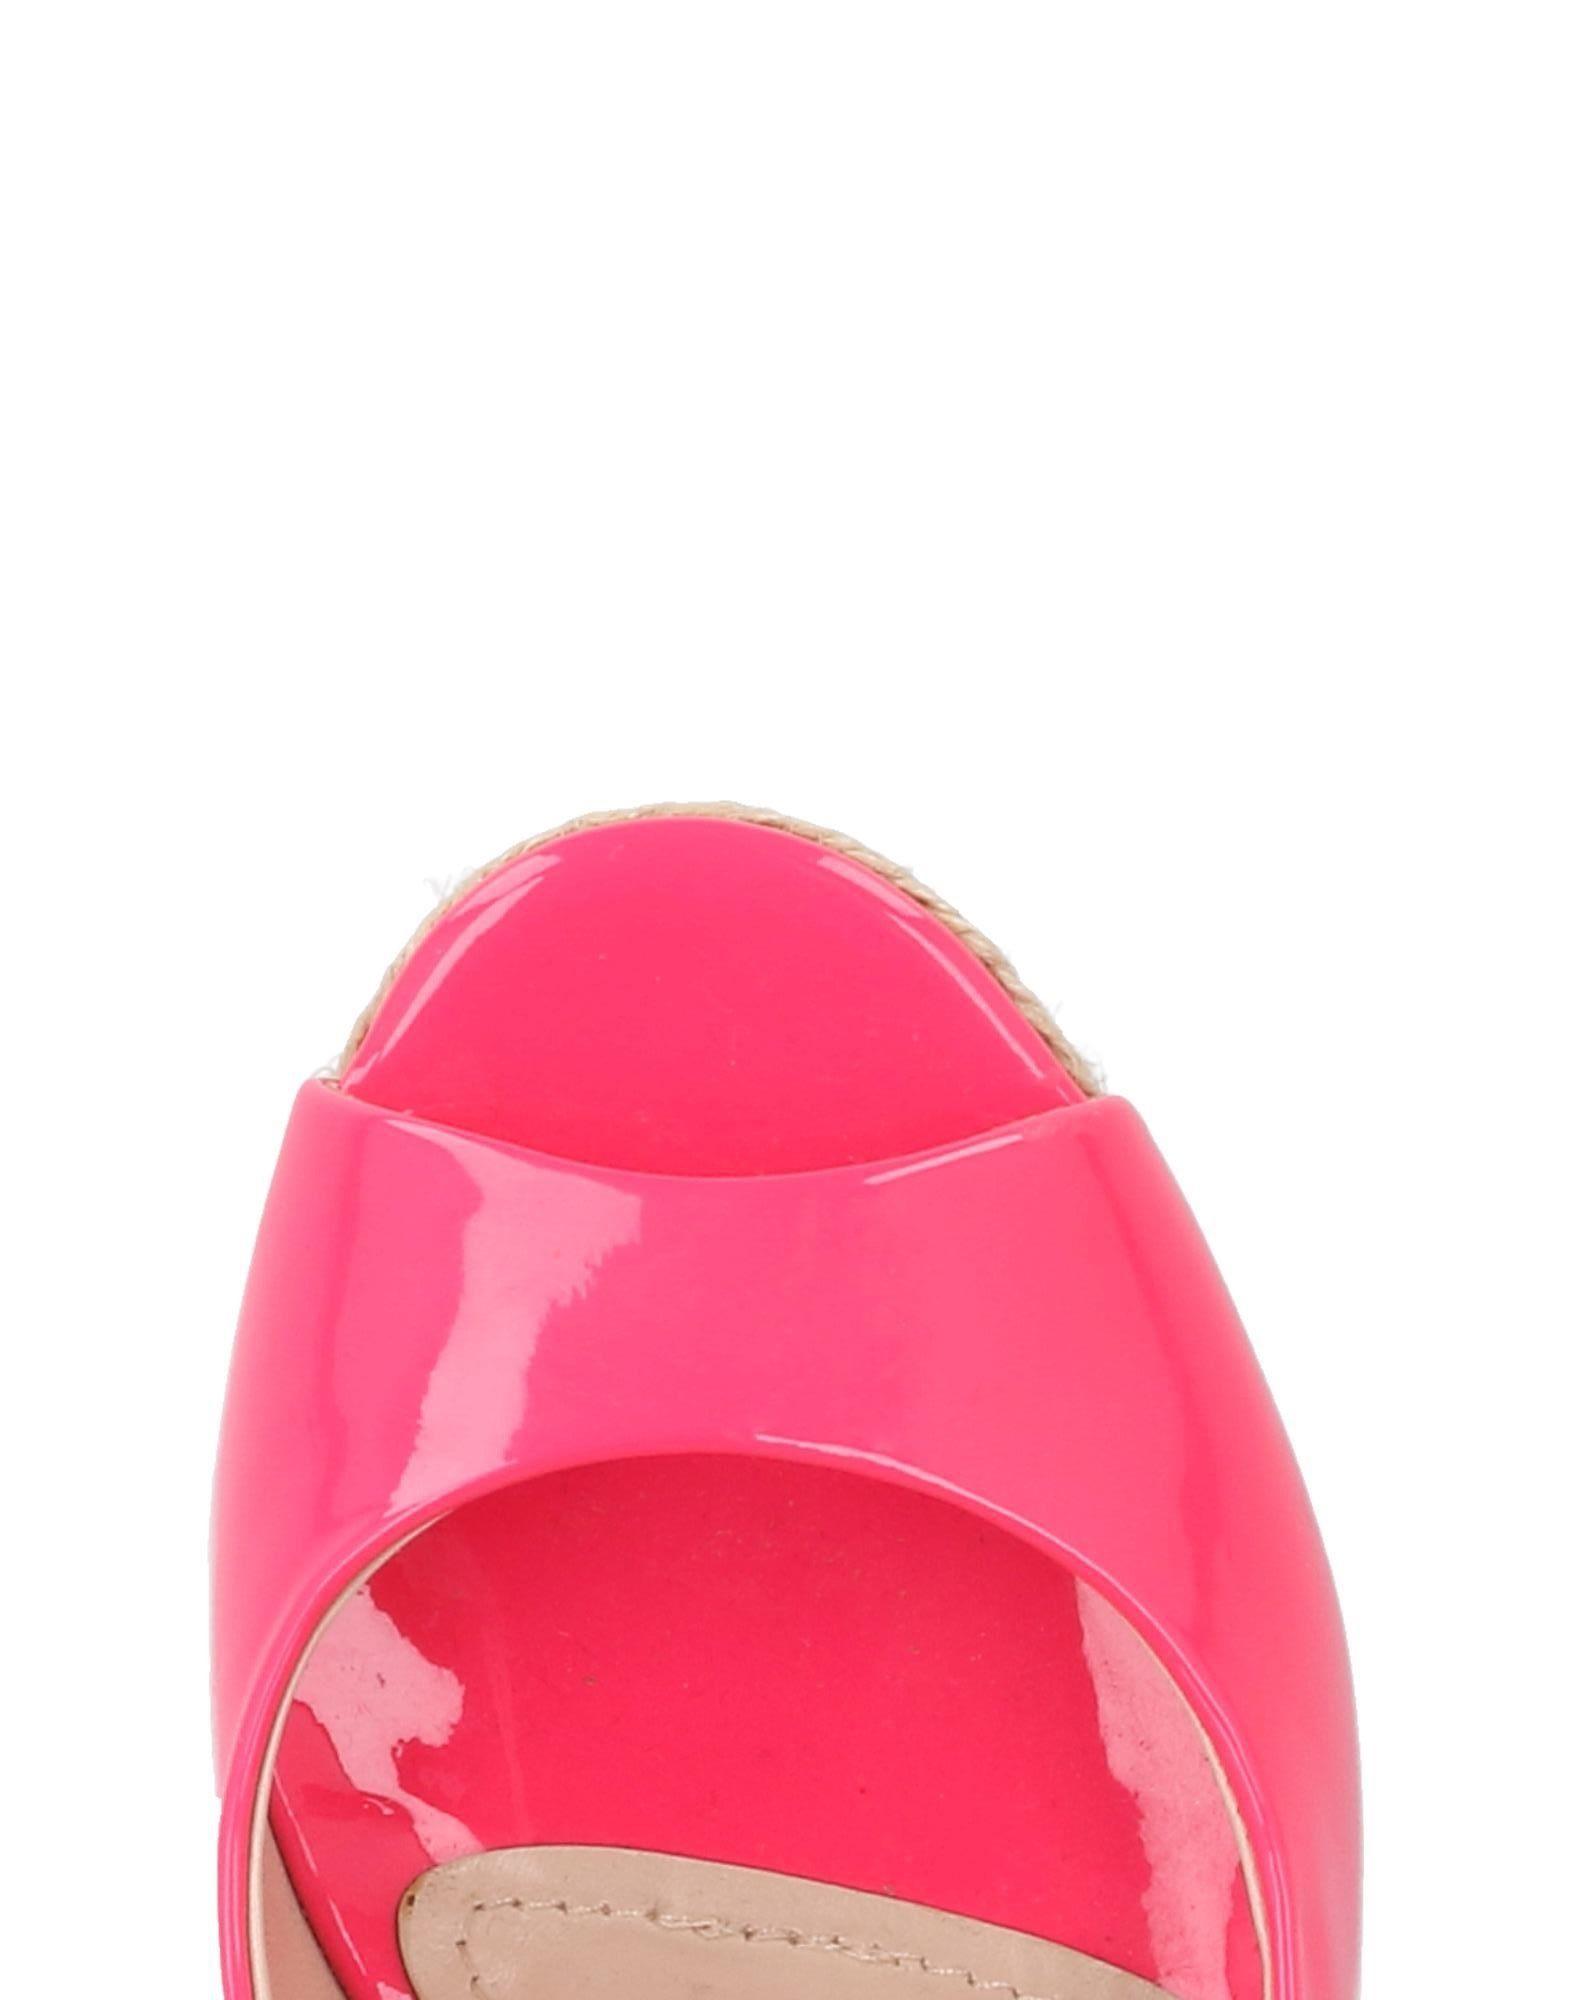 Gianni Renzi®  Couture Sandalen Preis-Leistungs-Verhältnis, Damen Gutes Preis-Leistungs-Verhältnis, Sandalen es lohnt sich 86c6d7